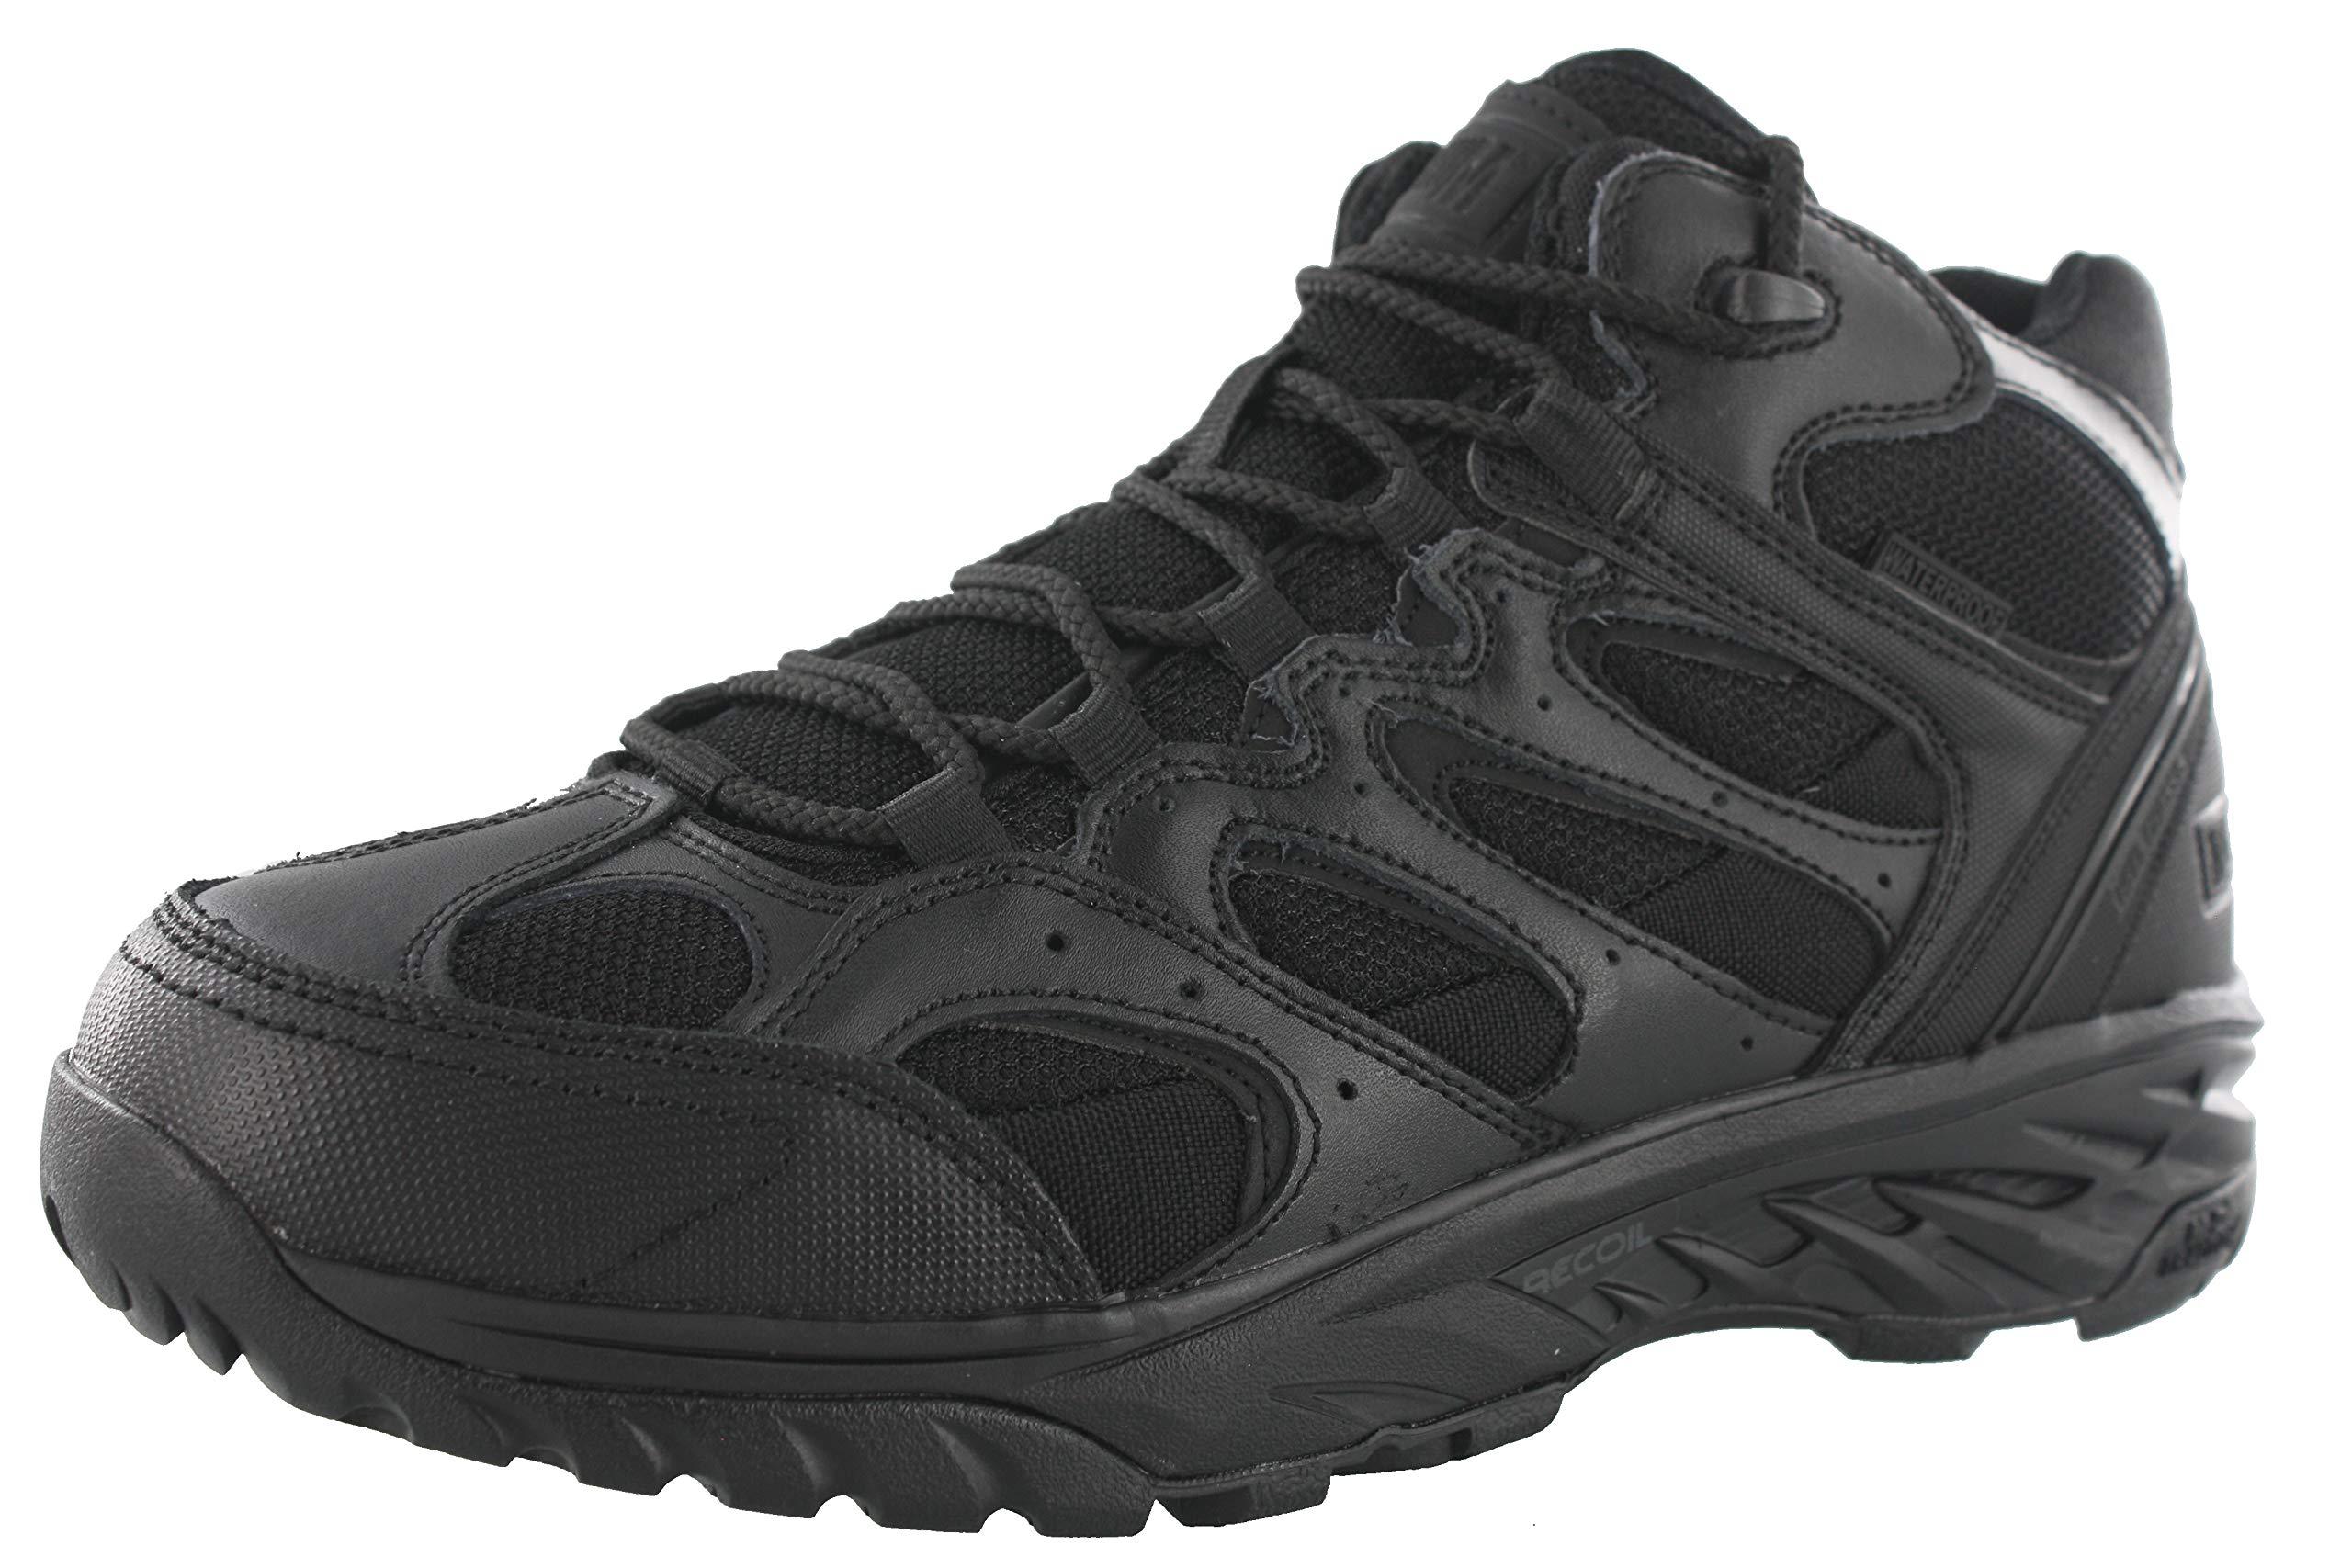 Magnum Men's, Wild Fire Tactical 5.0 Boots Black 9 M